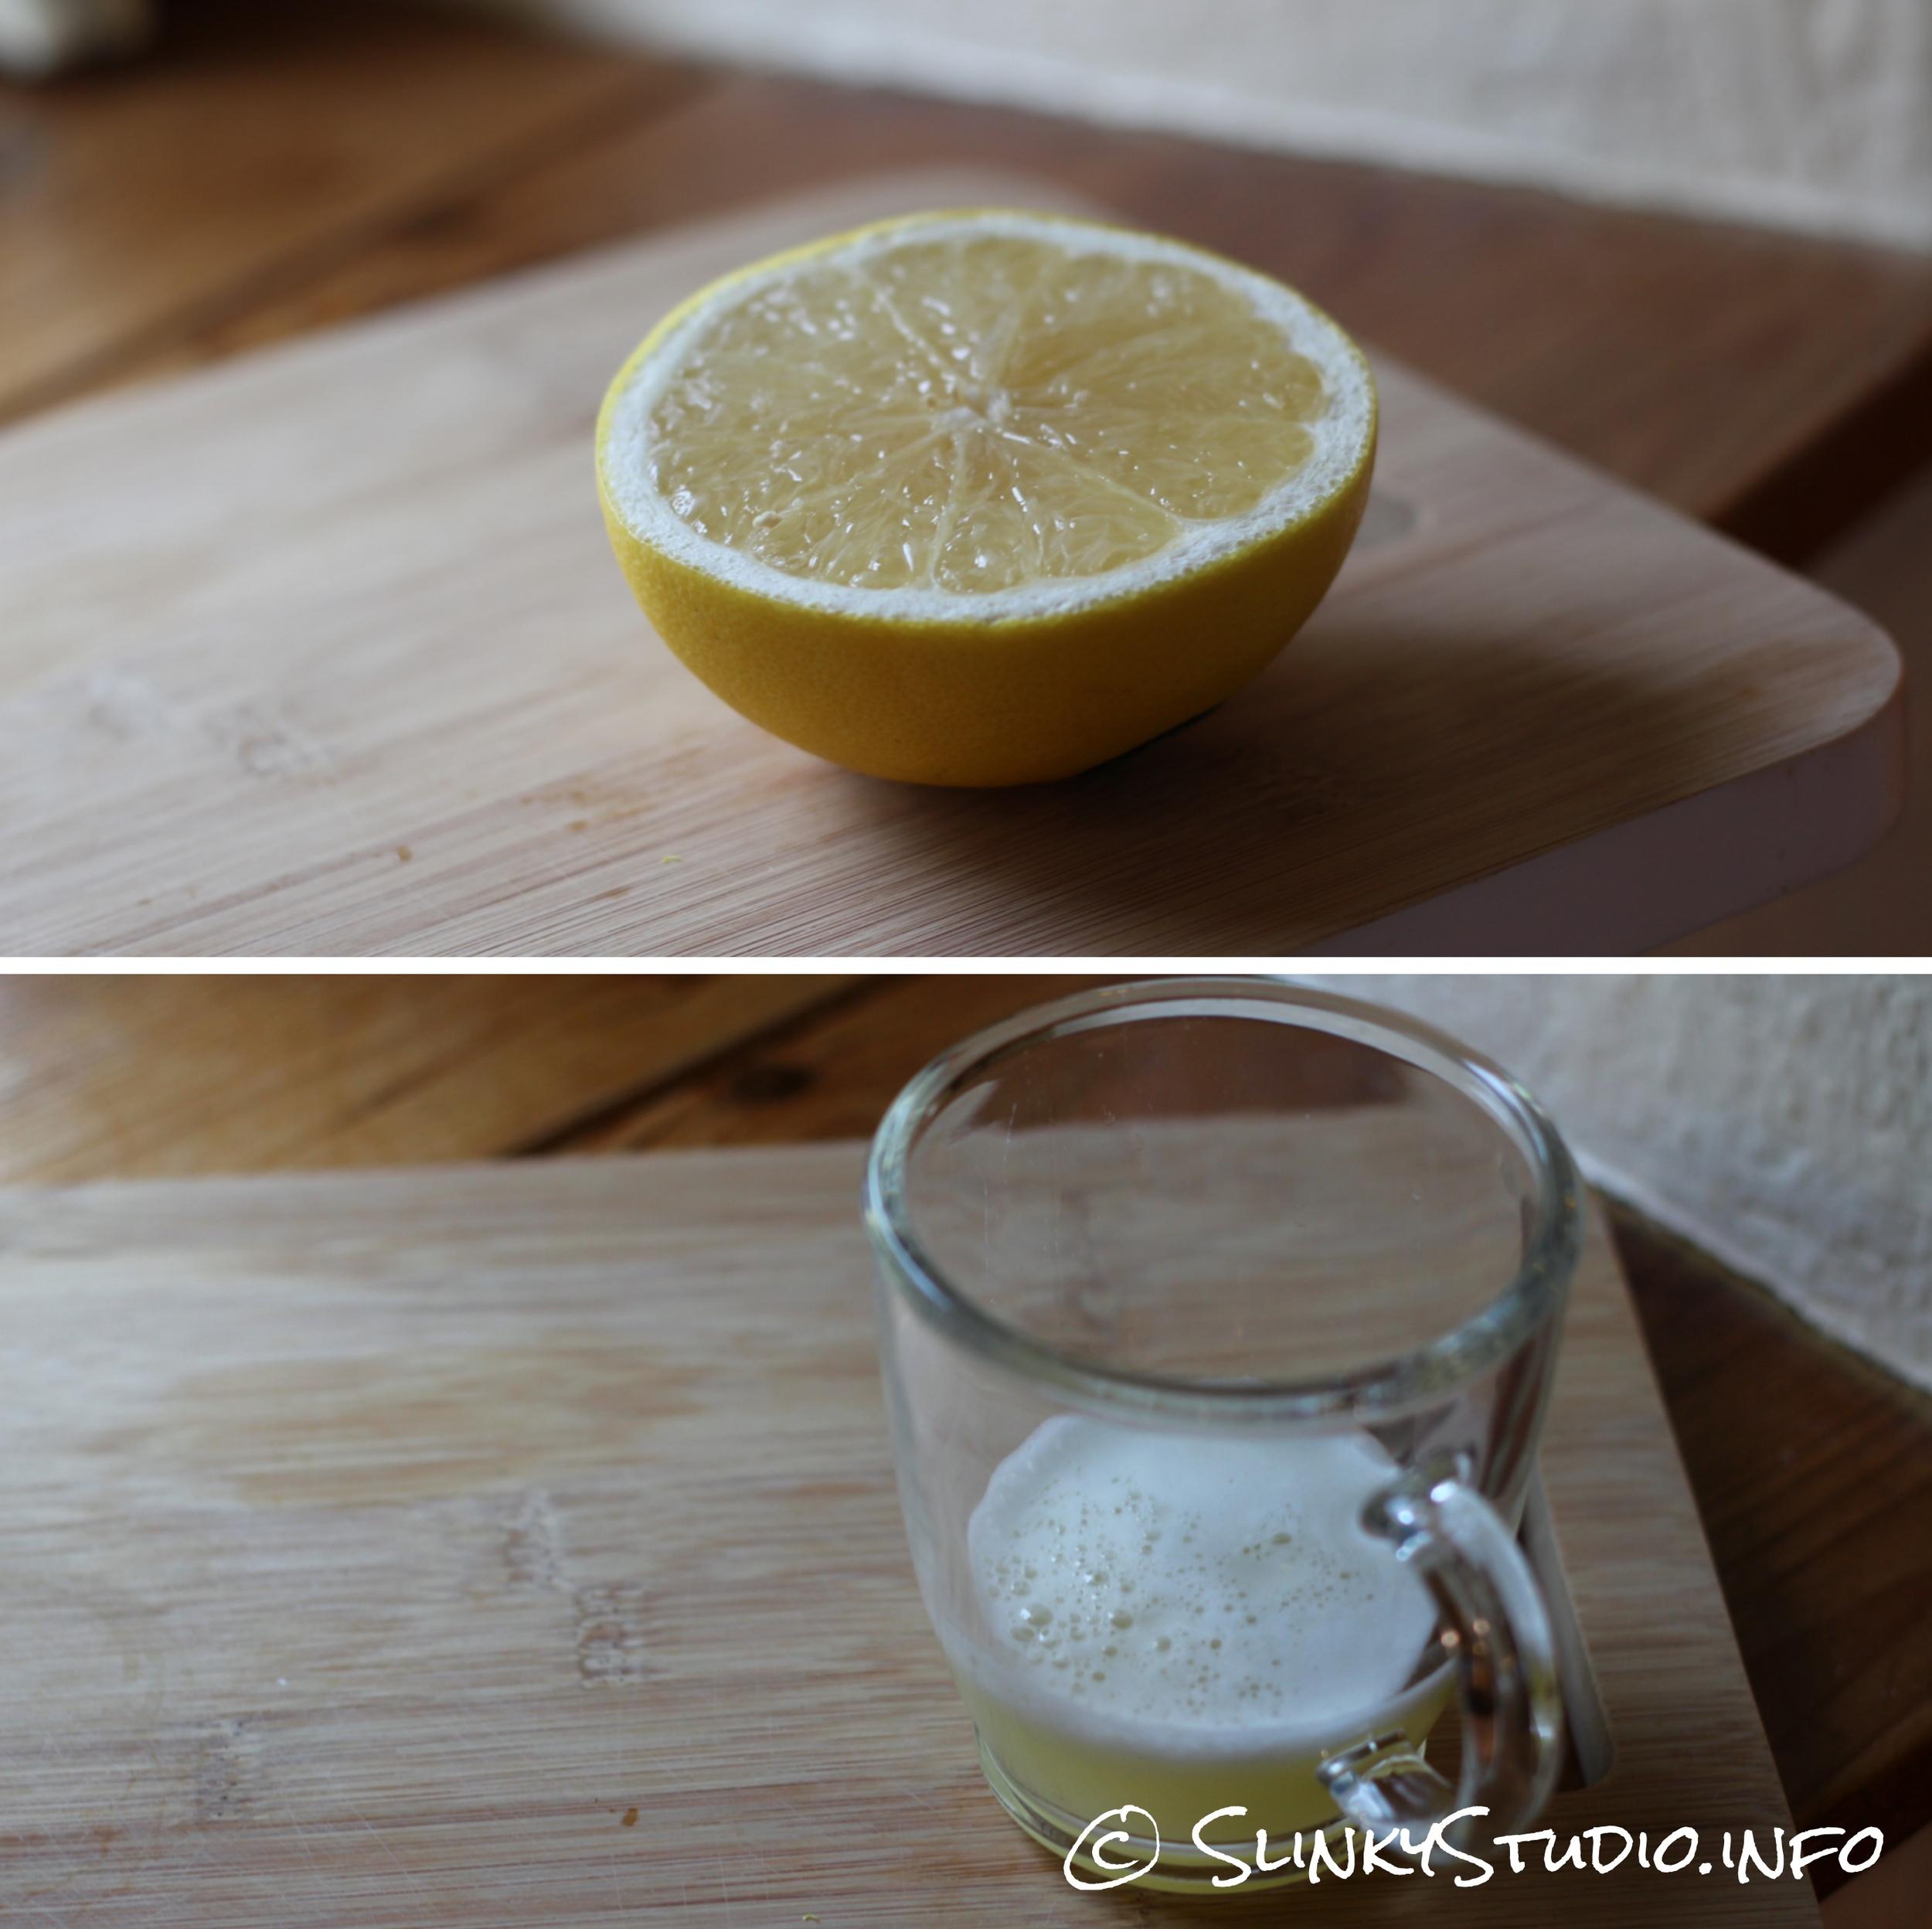 Novis Vita Juicer Grapefruit Juice